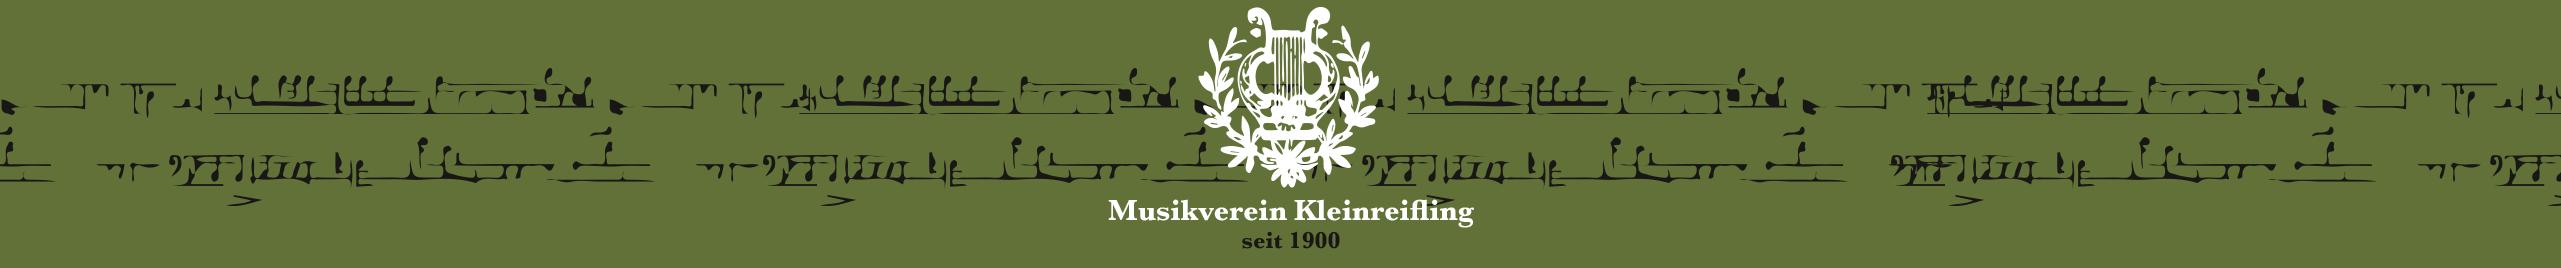 Musikverein Kleinreifling